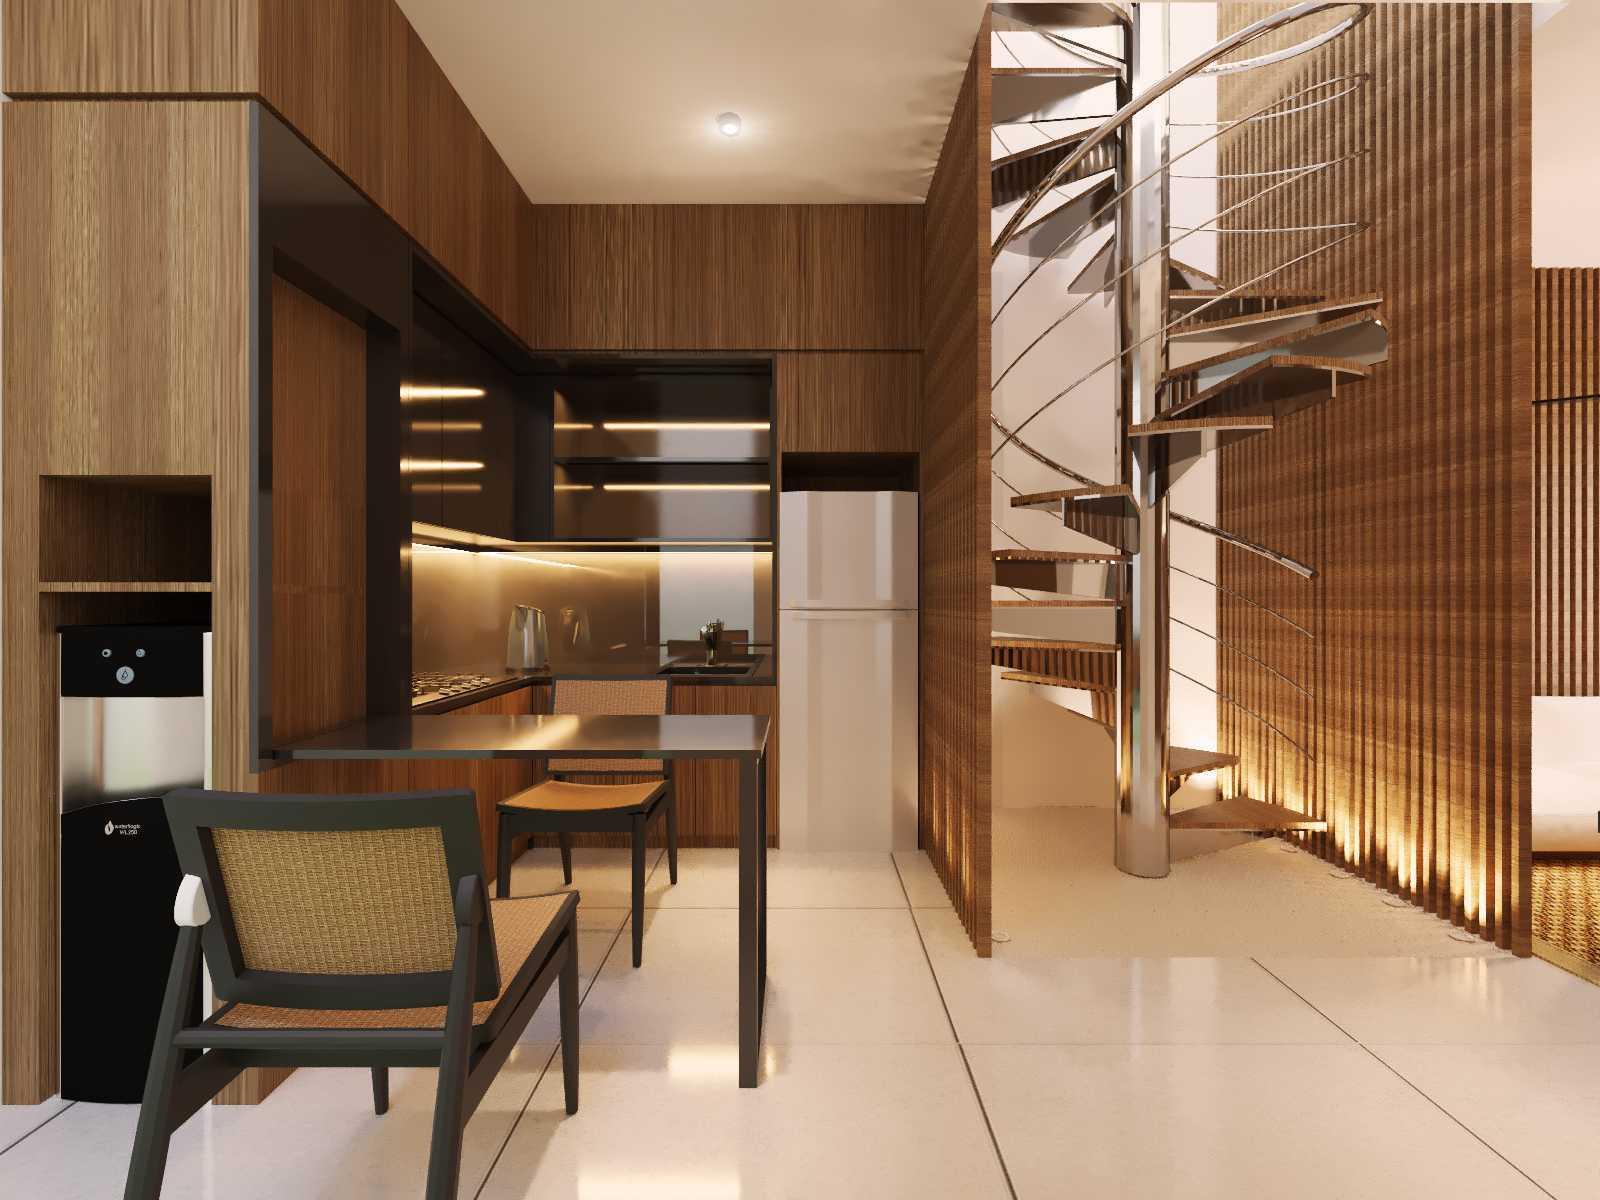 Mitrasasana - Design & Build Yg House Bekasi, Kota Bks, Jawa Barat, Indonesia Bekasi, Kota Bks, Jawa Barat, Indonesia Mitrasasana-Design-Build-Yg-House   78697